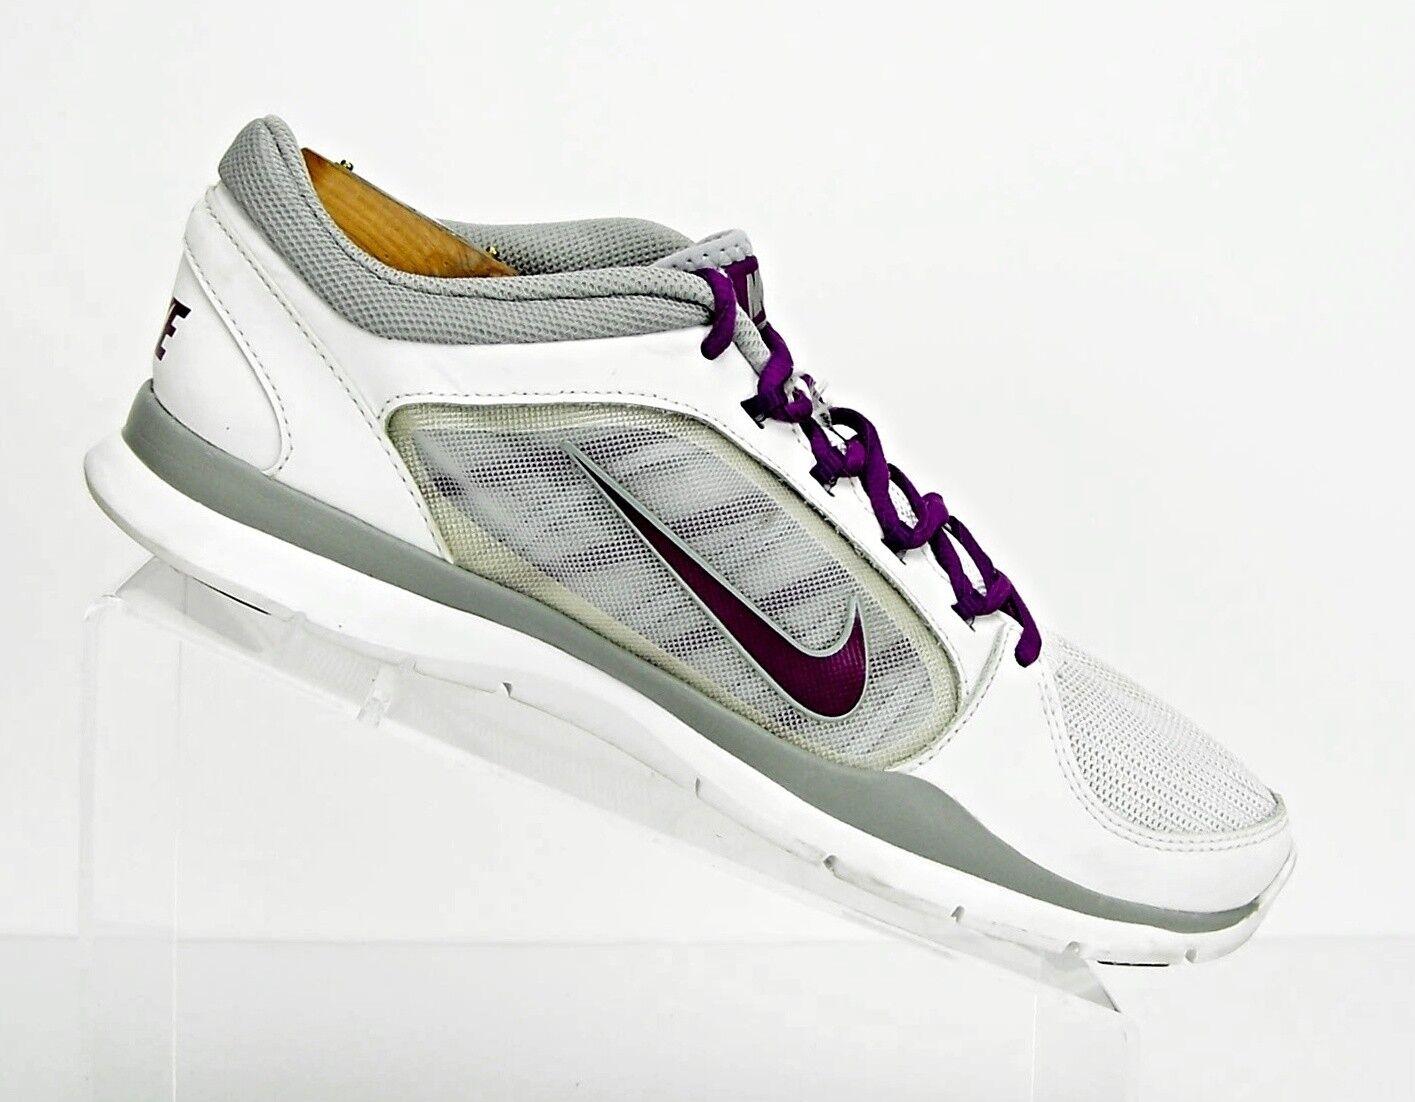 d3f942b6b9f0 ... Nike Women s Size 10 10 10 Flex Trainer Training Shoes 643083  White Bright Grape  ...